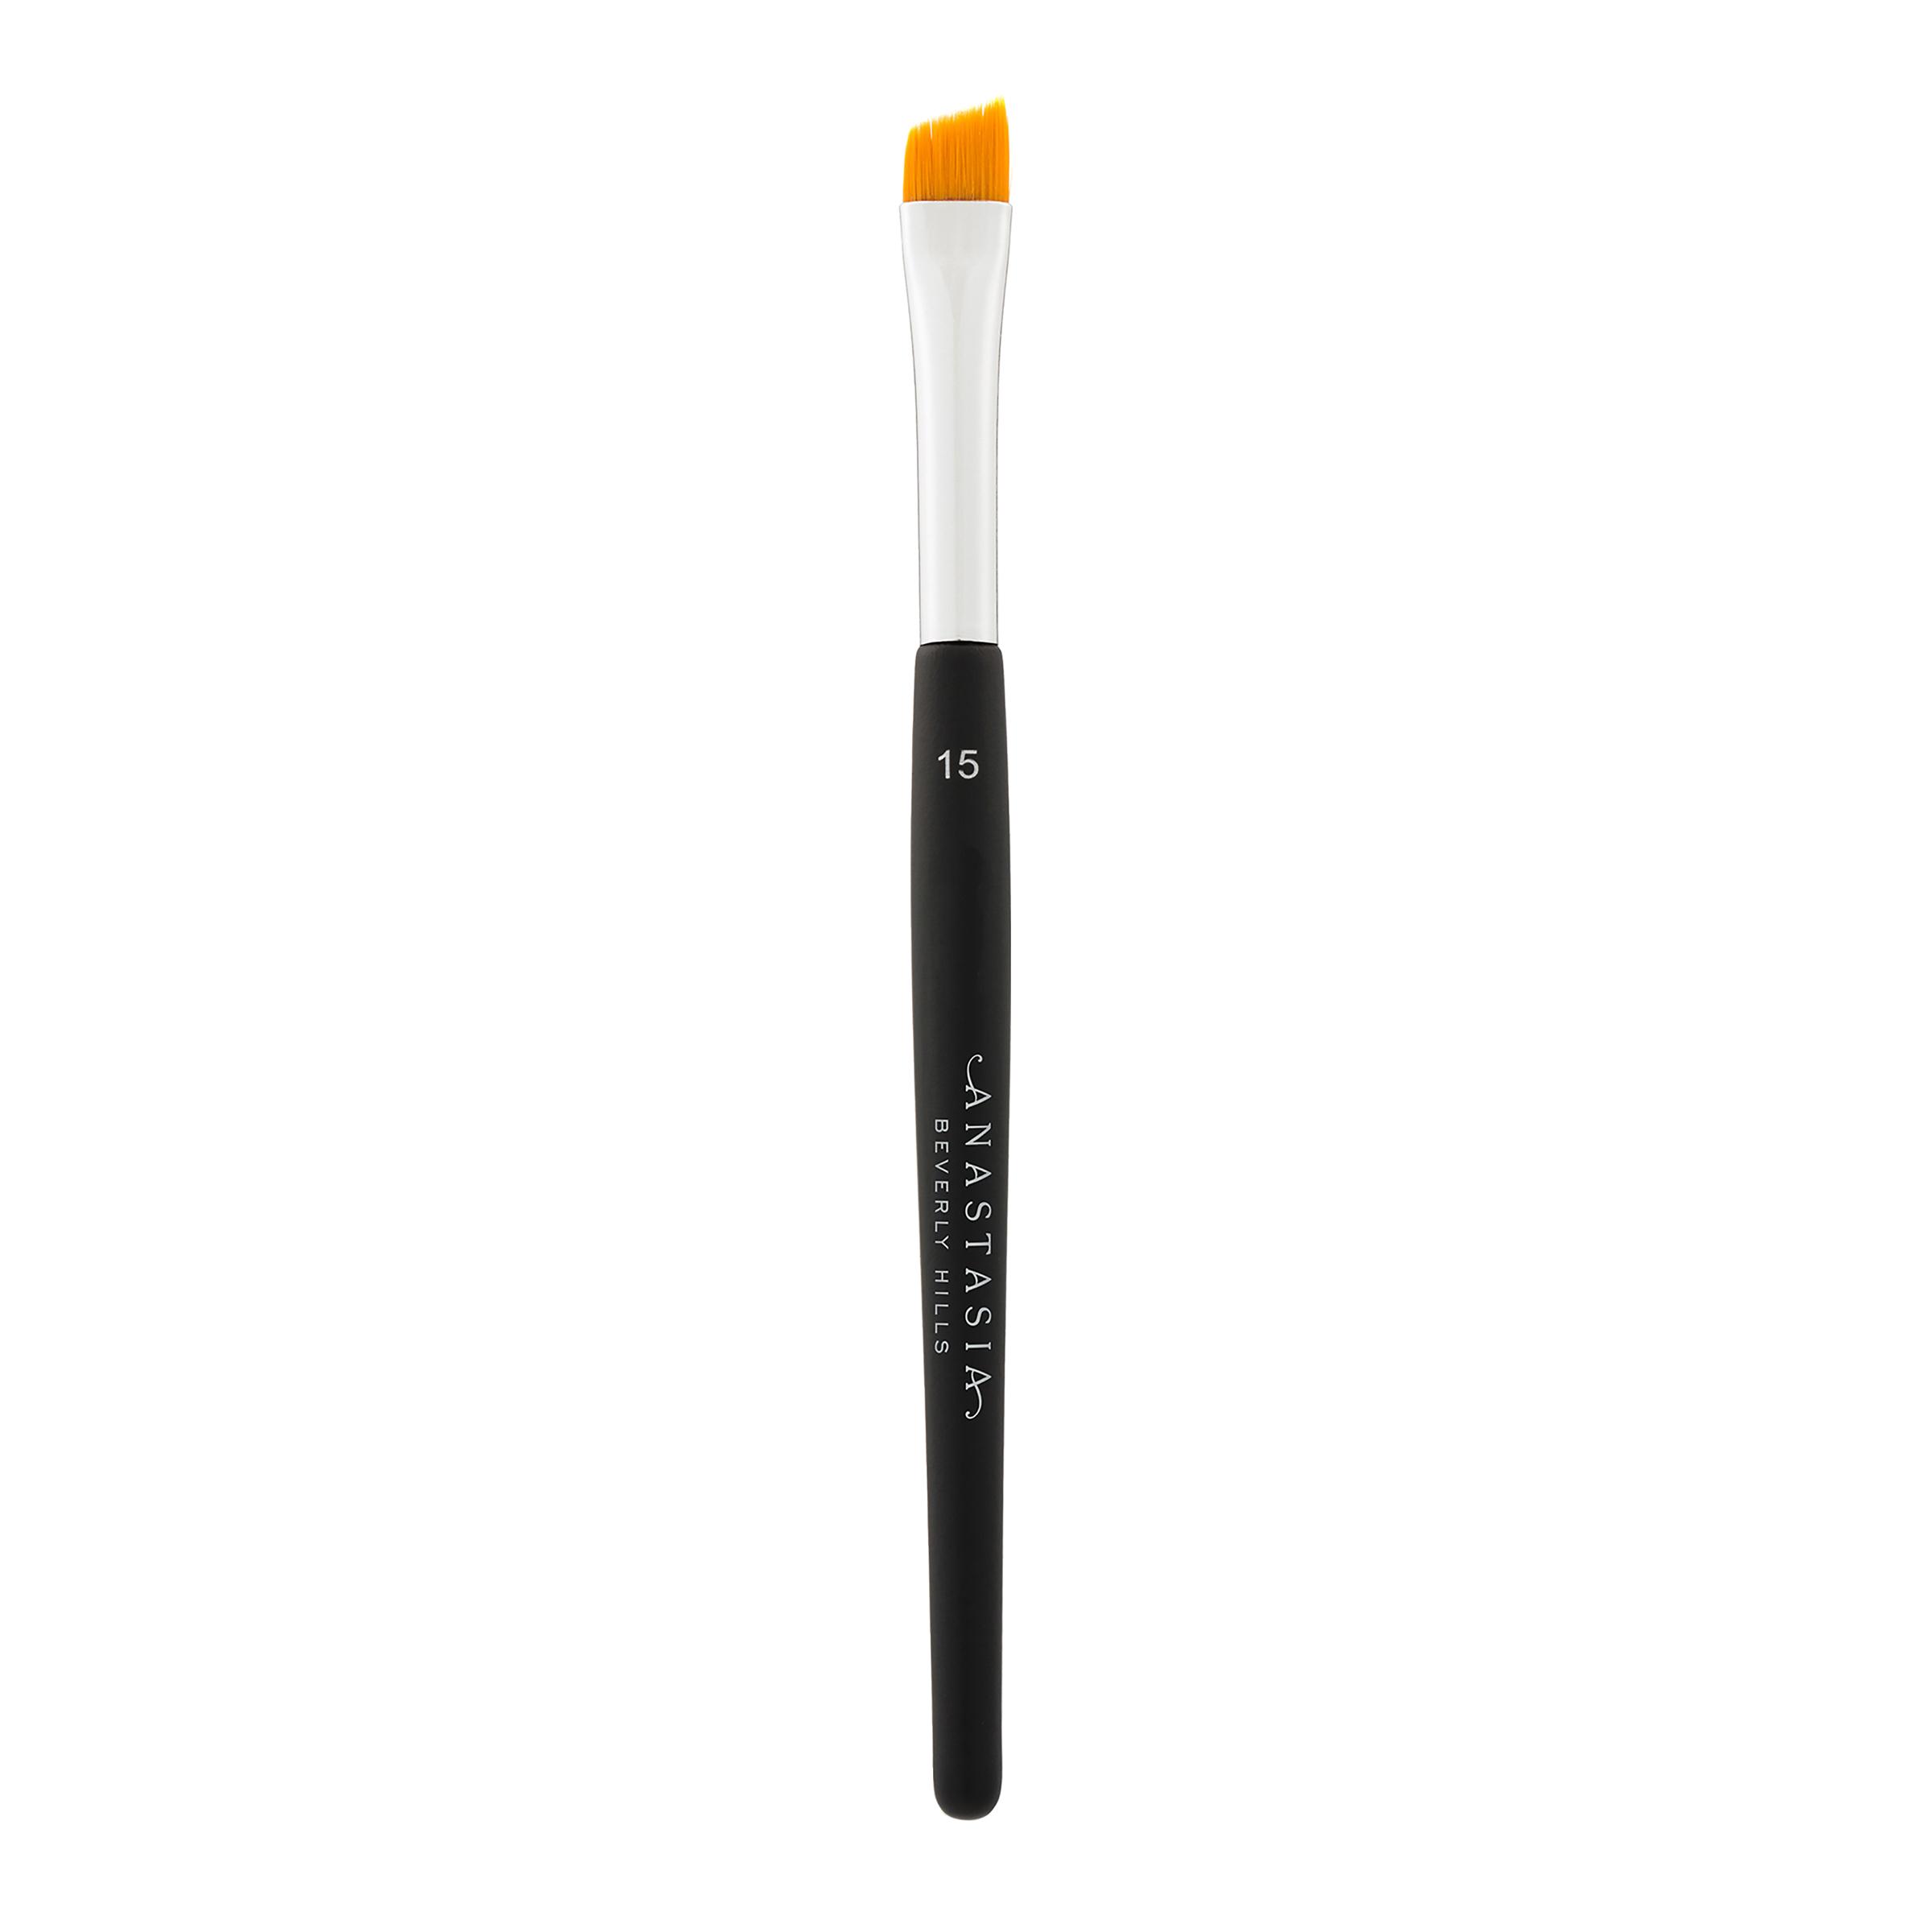 Angled Cut Brush Small #15